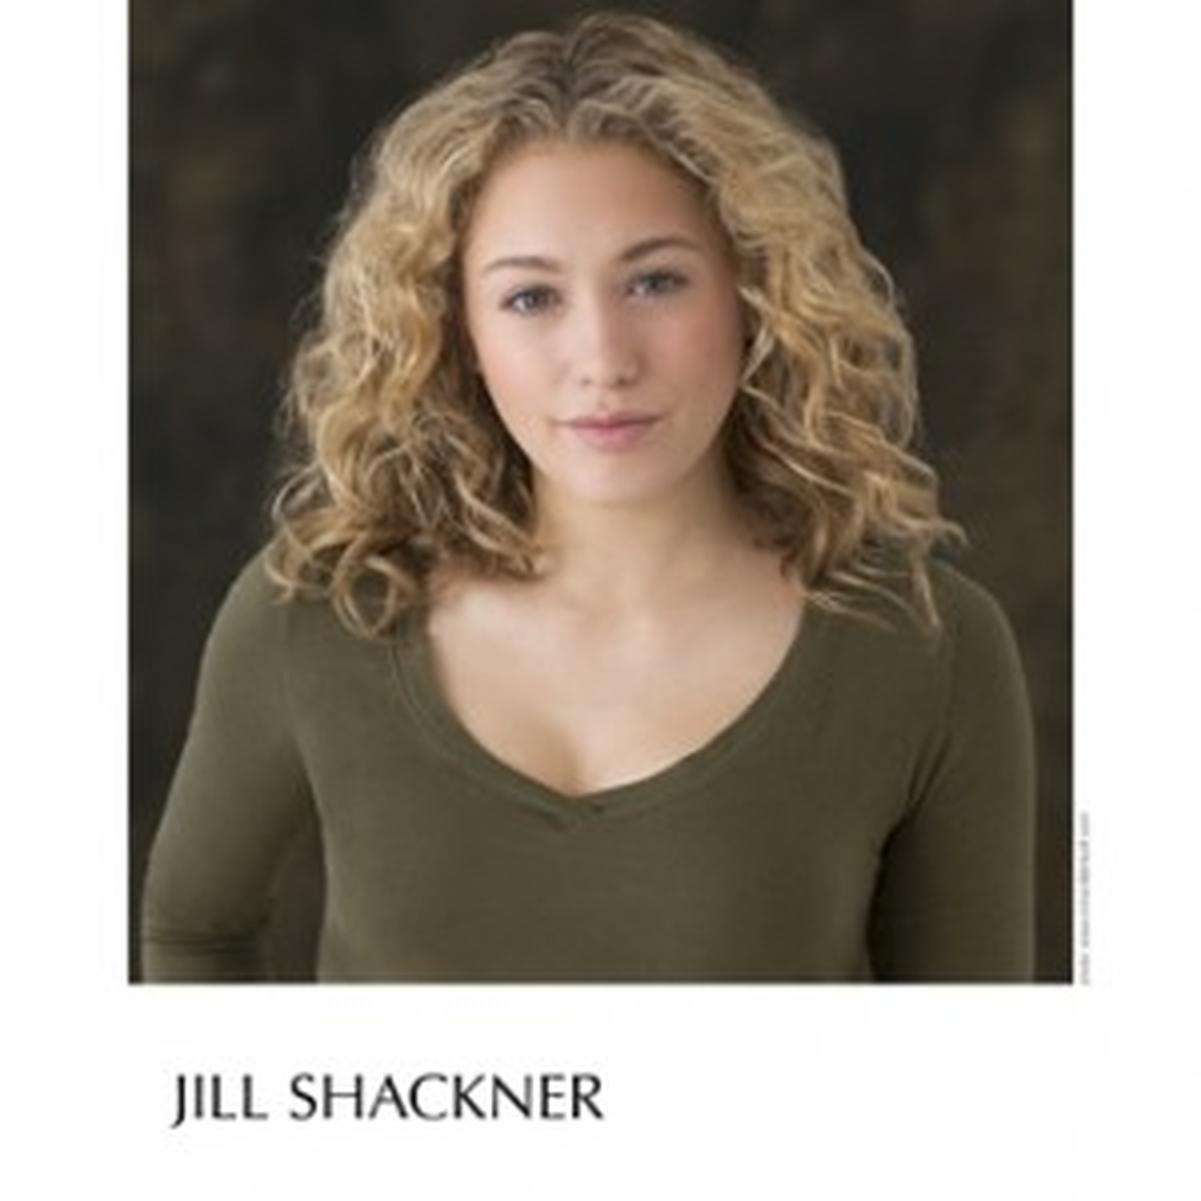 JillShackner